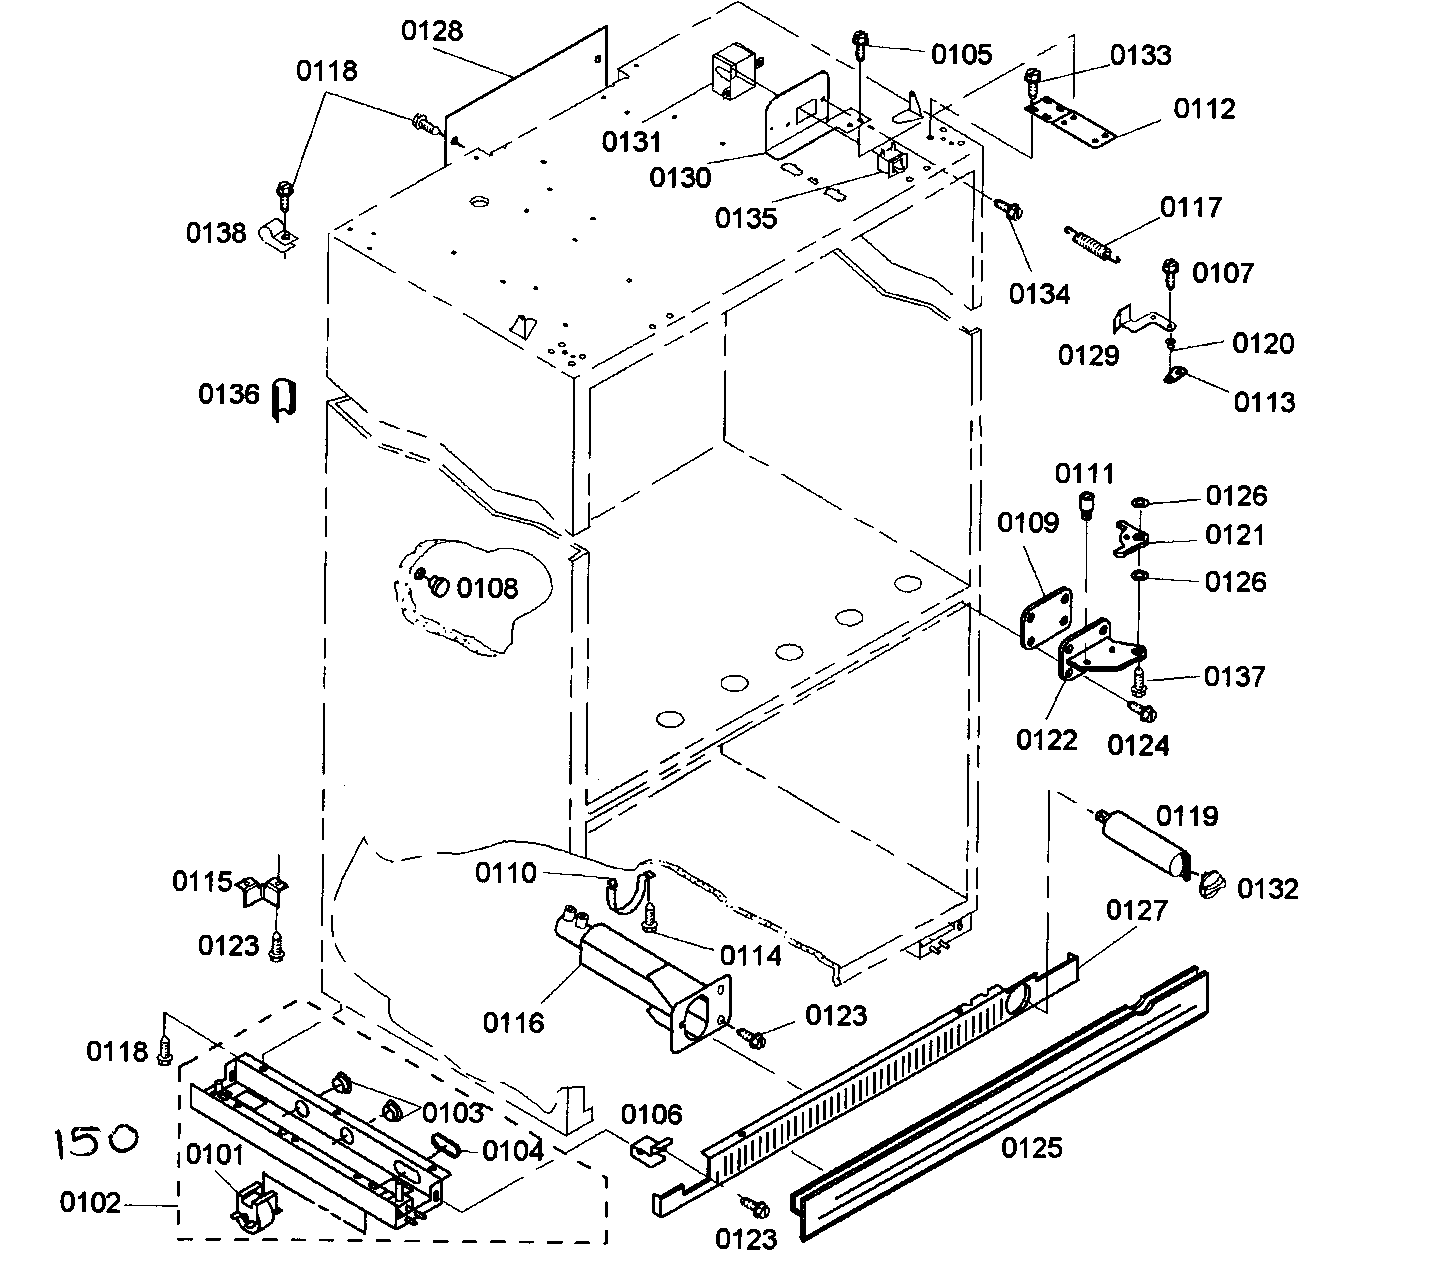 Thermador model KBURT3655E01 bottom-mount refrigerator